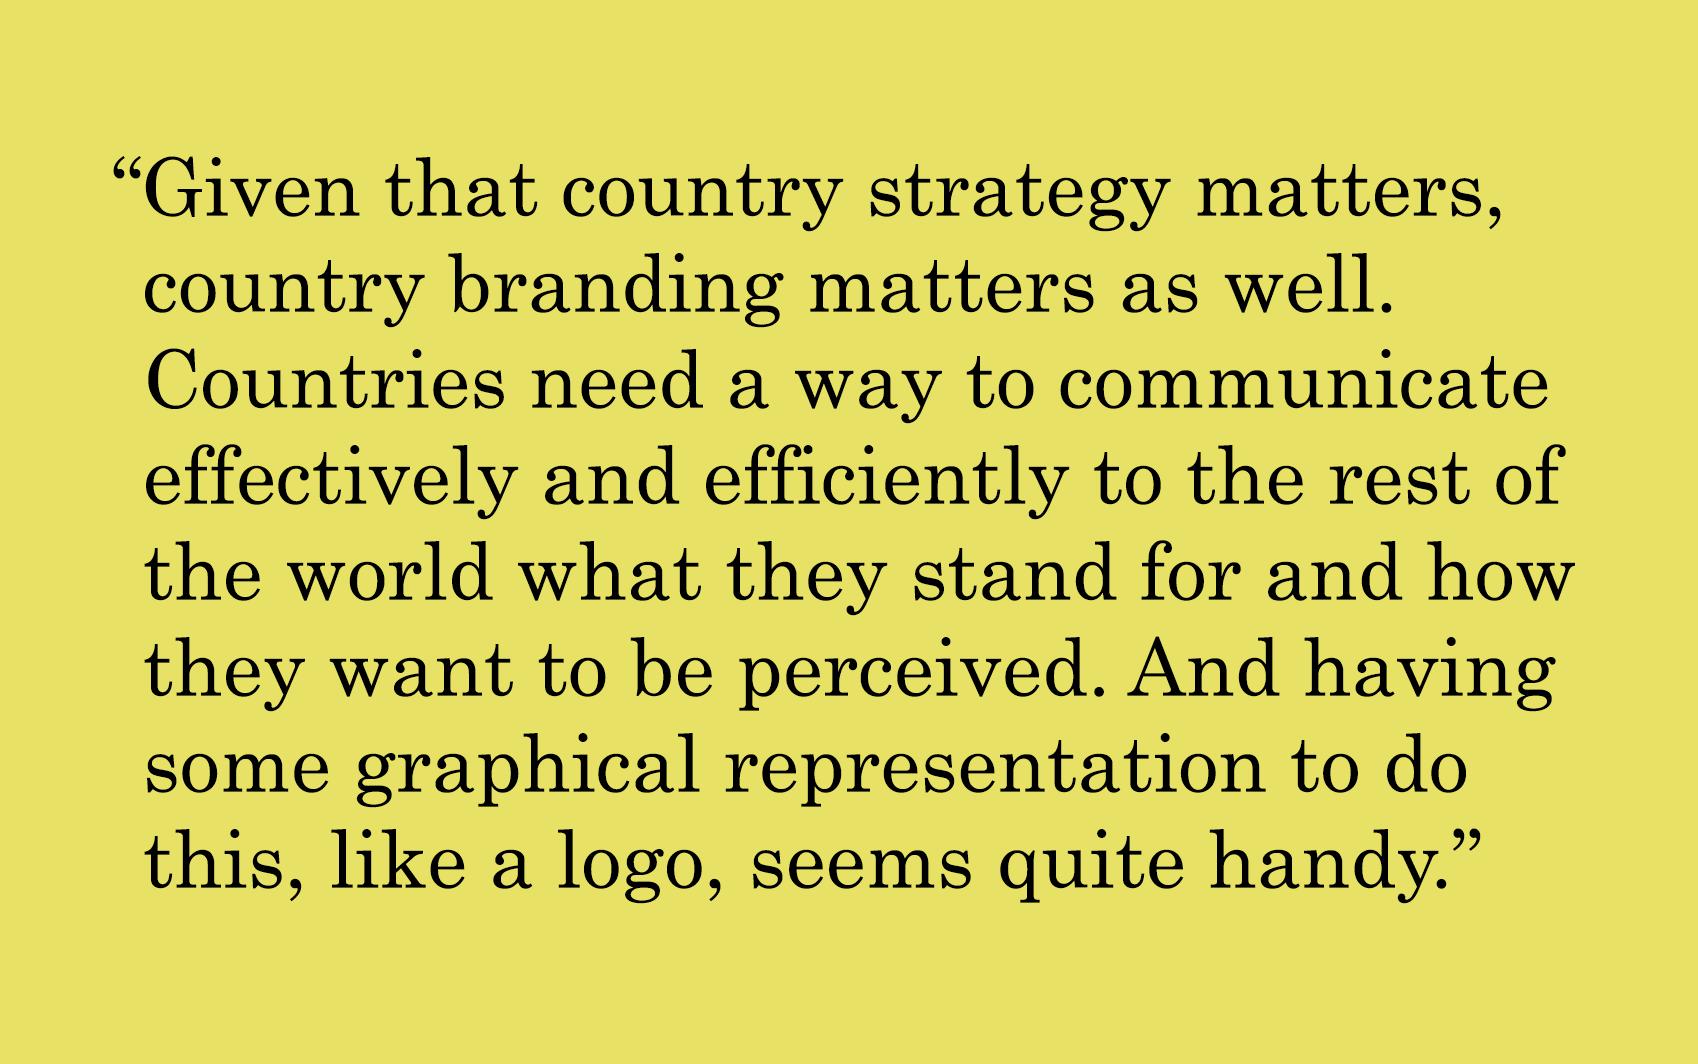 Do Countries Need Logos?